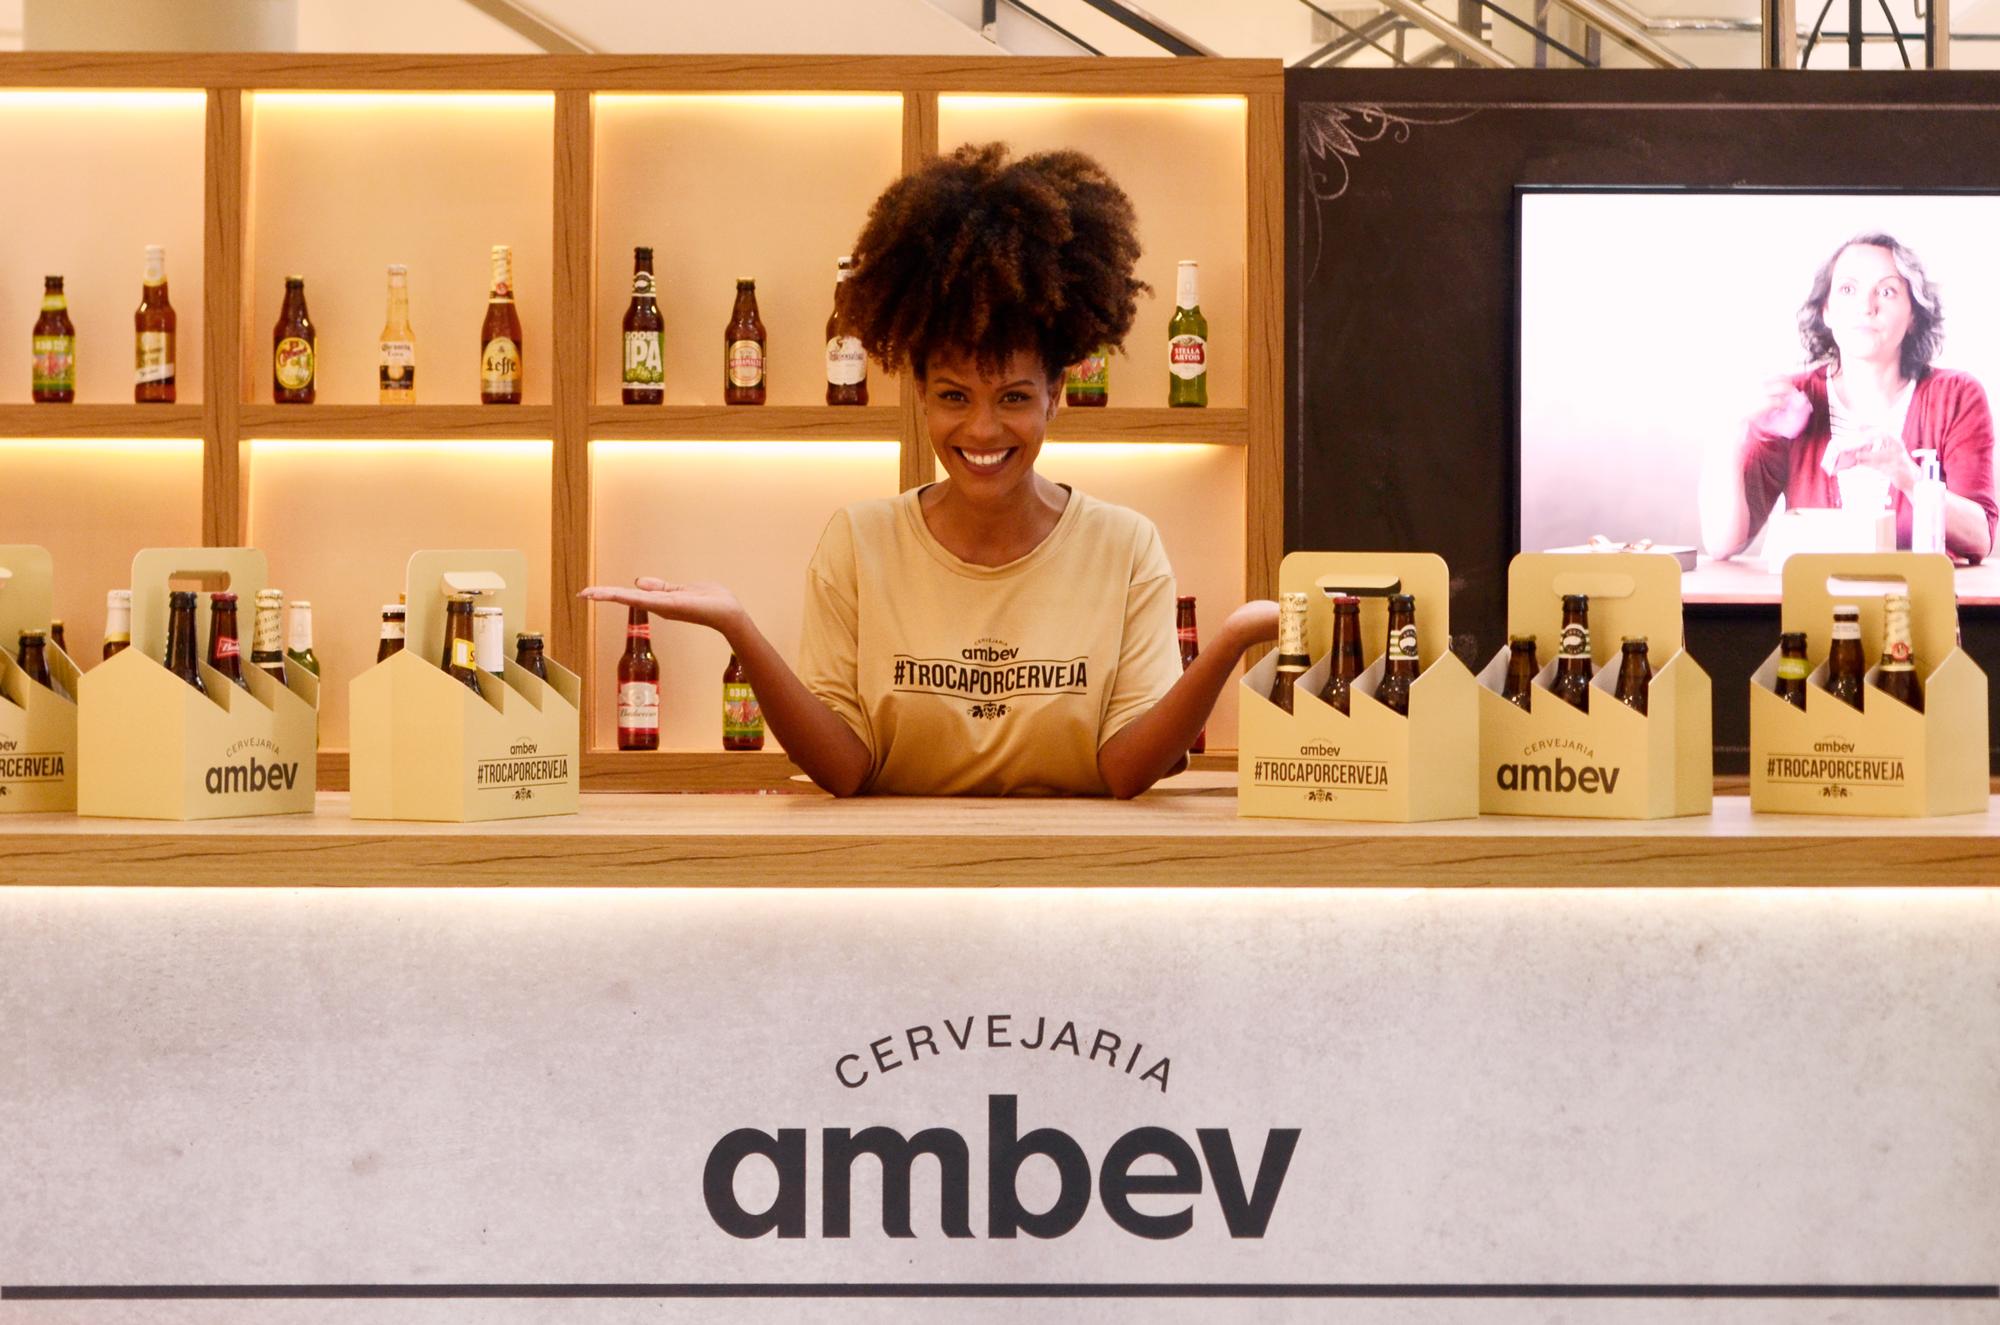 Ambev-PopUpStore3